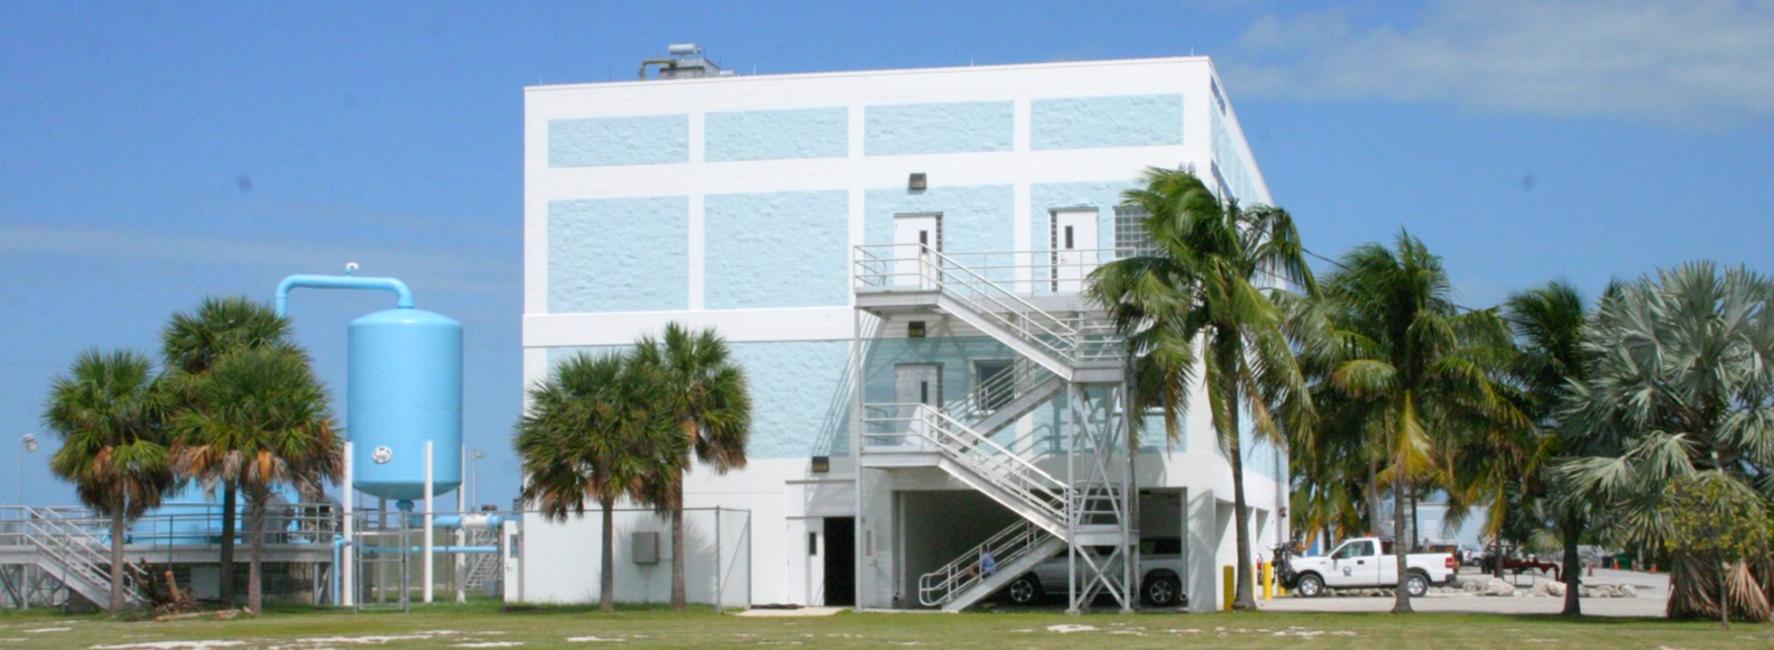 FKAA Stock Island Seawater RO Facility